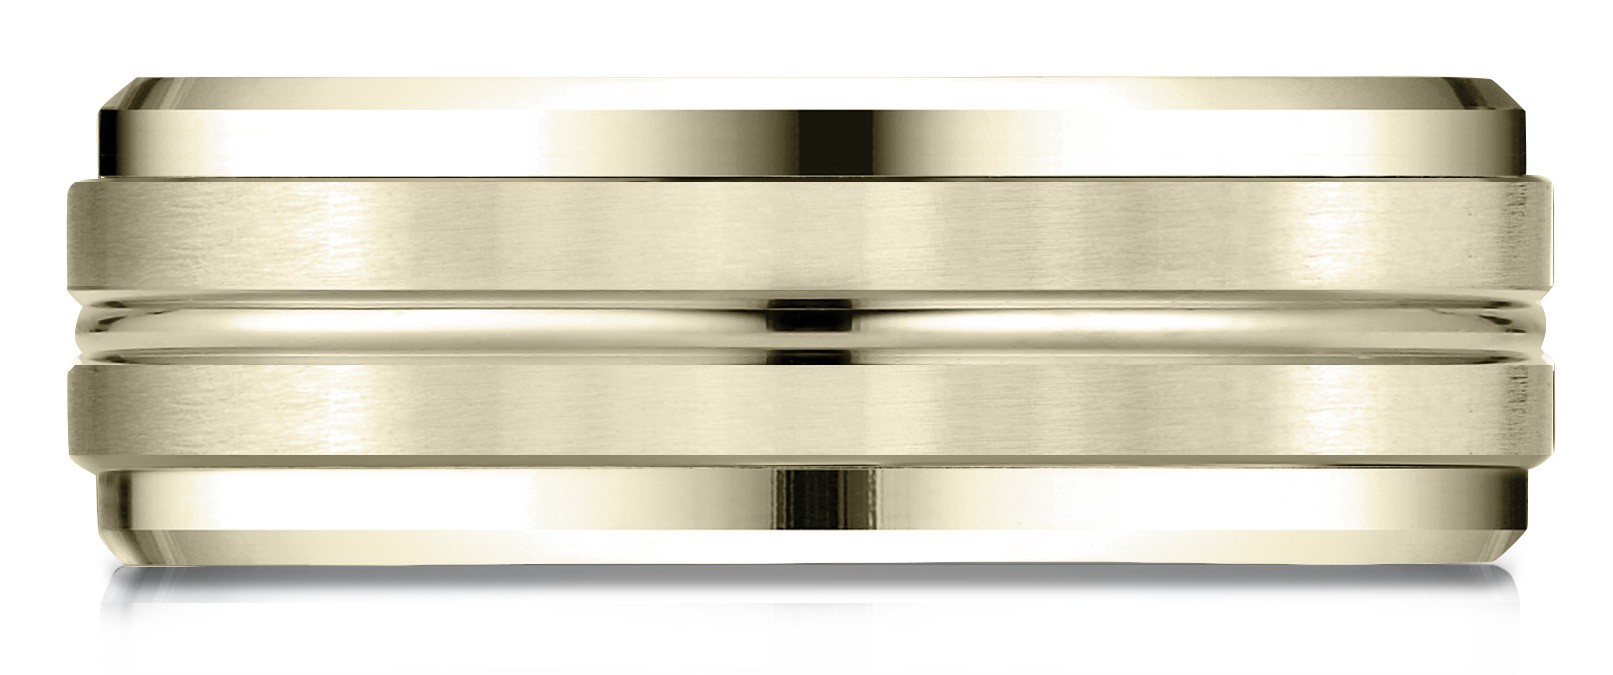 14k Yellow Gold 8mm Comfort-fit Drop Bevel Satin Center Cut Design Band